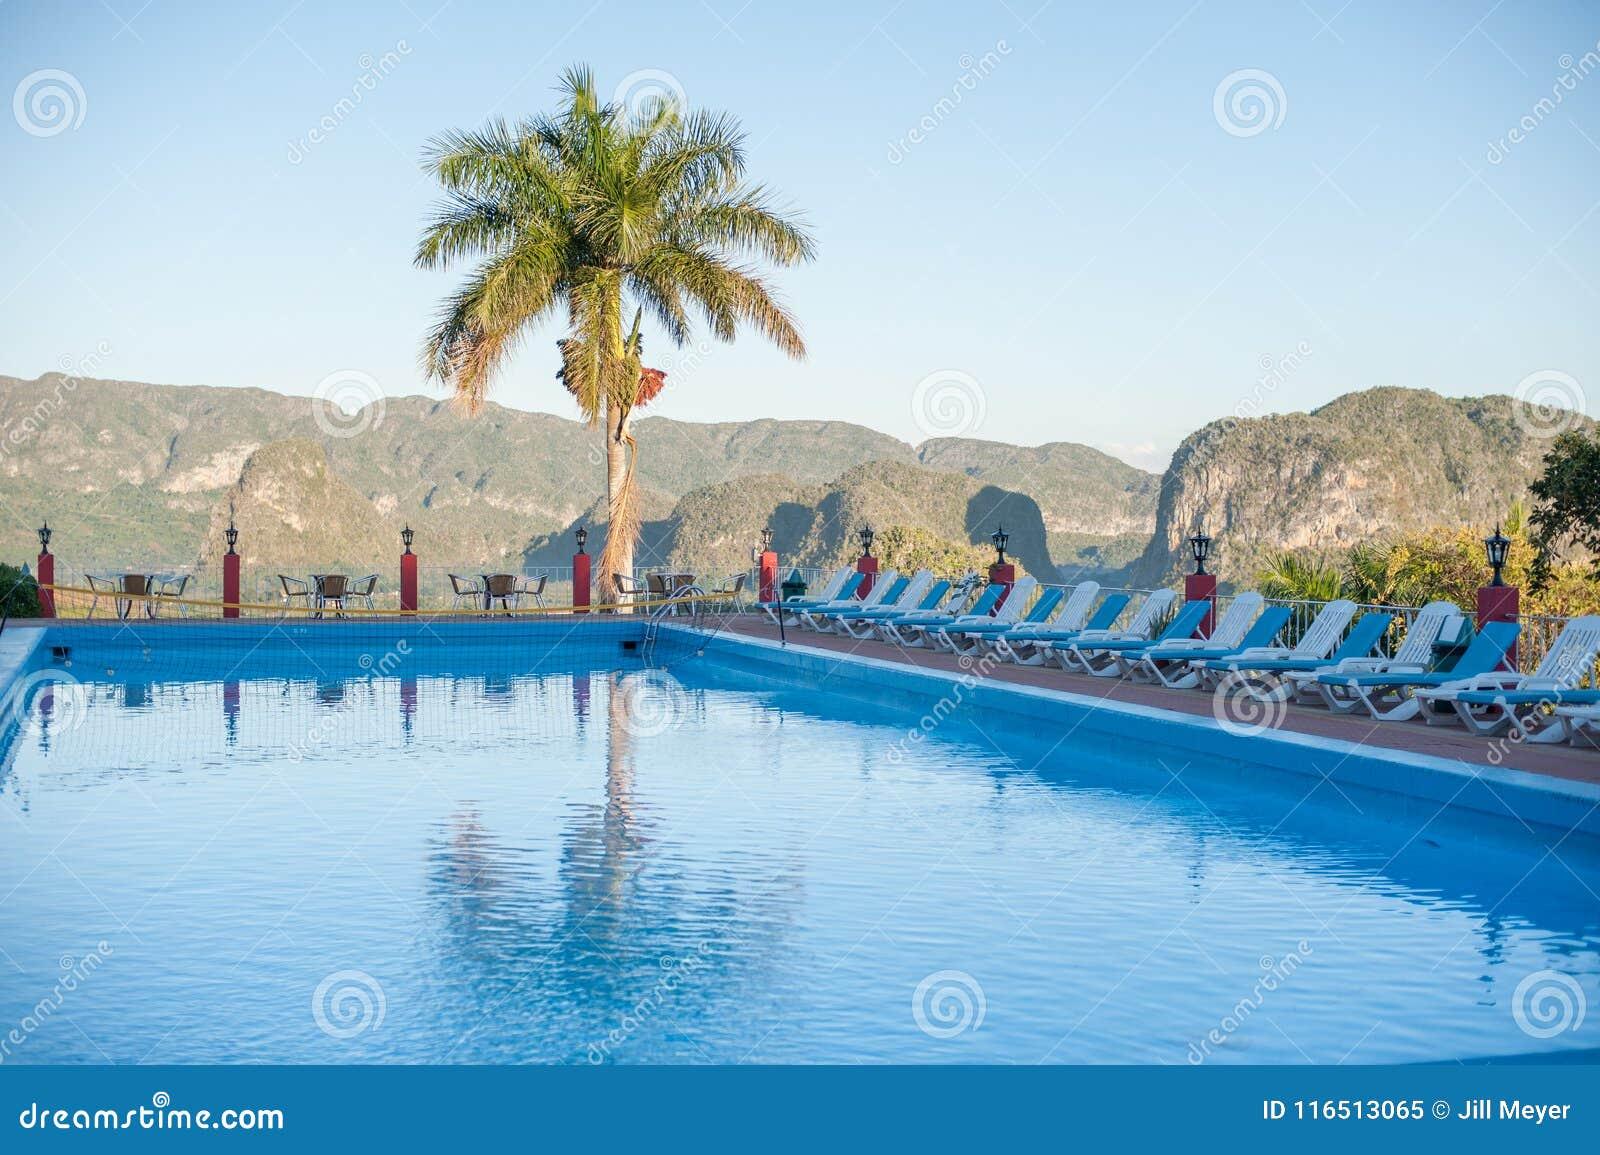 Vinales Valley, Swimming Pool